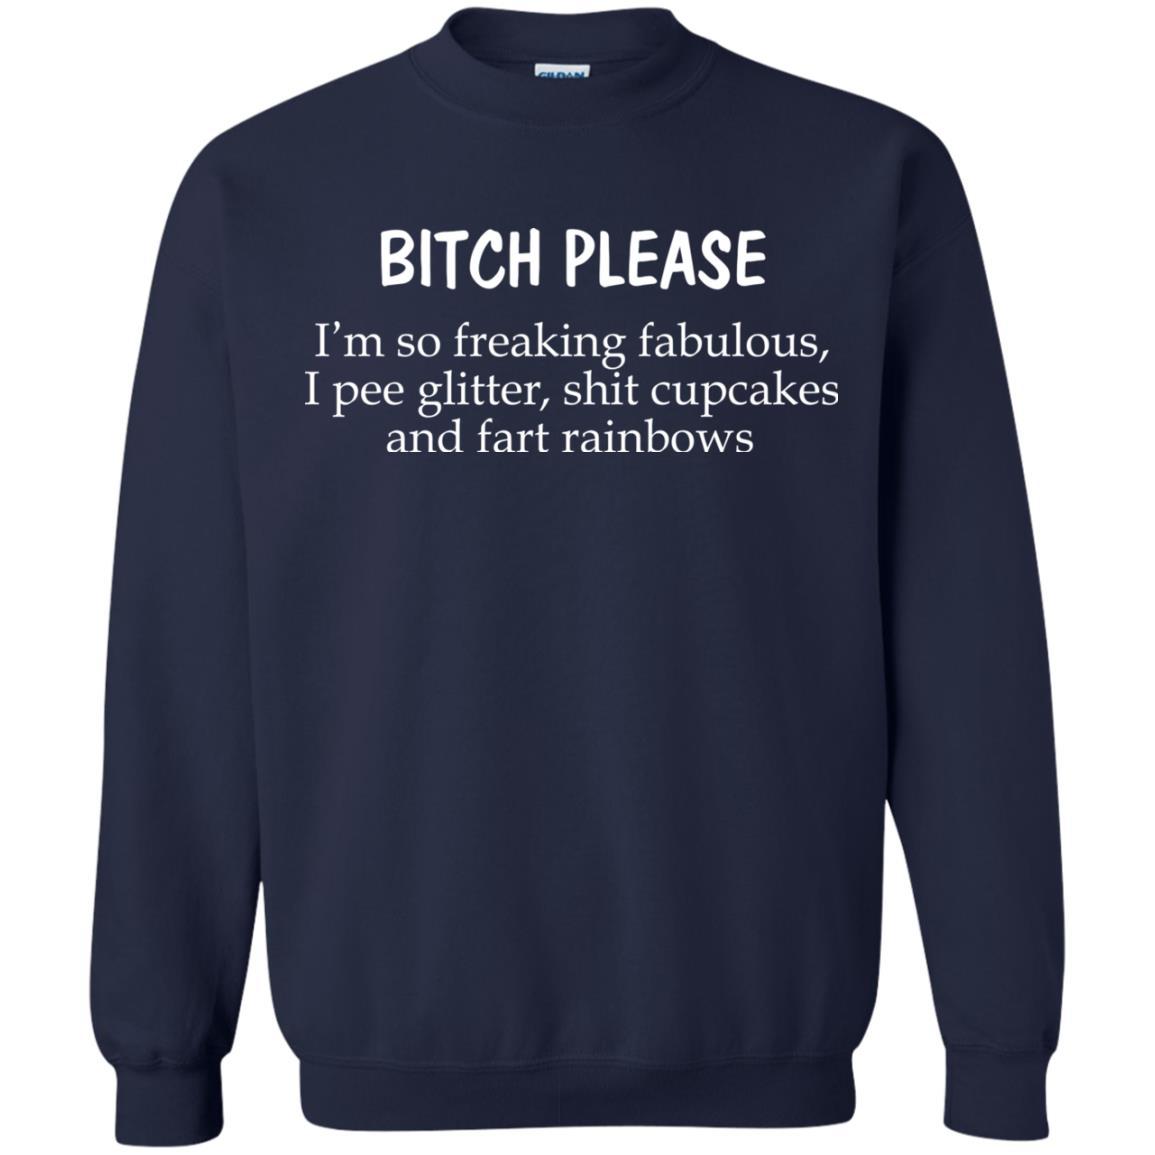 image 1249 - Bitch Please I'm so freaking fabulous t-shirt, sweater